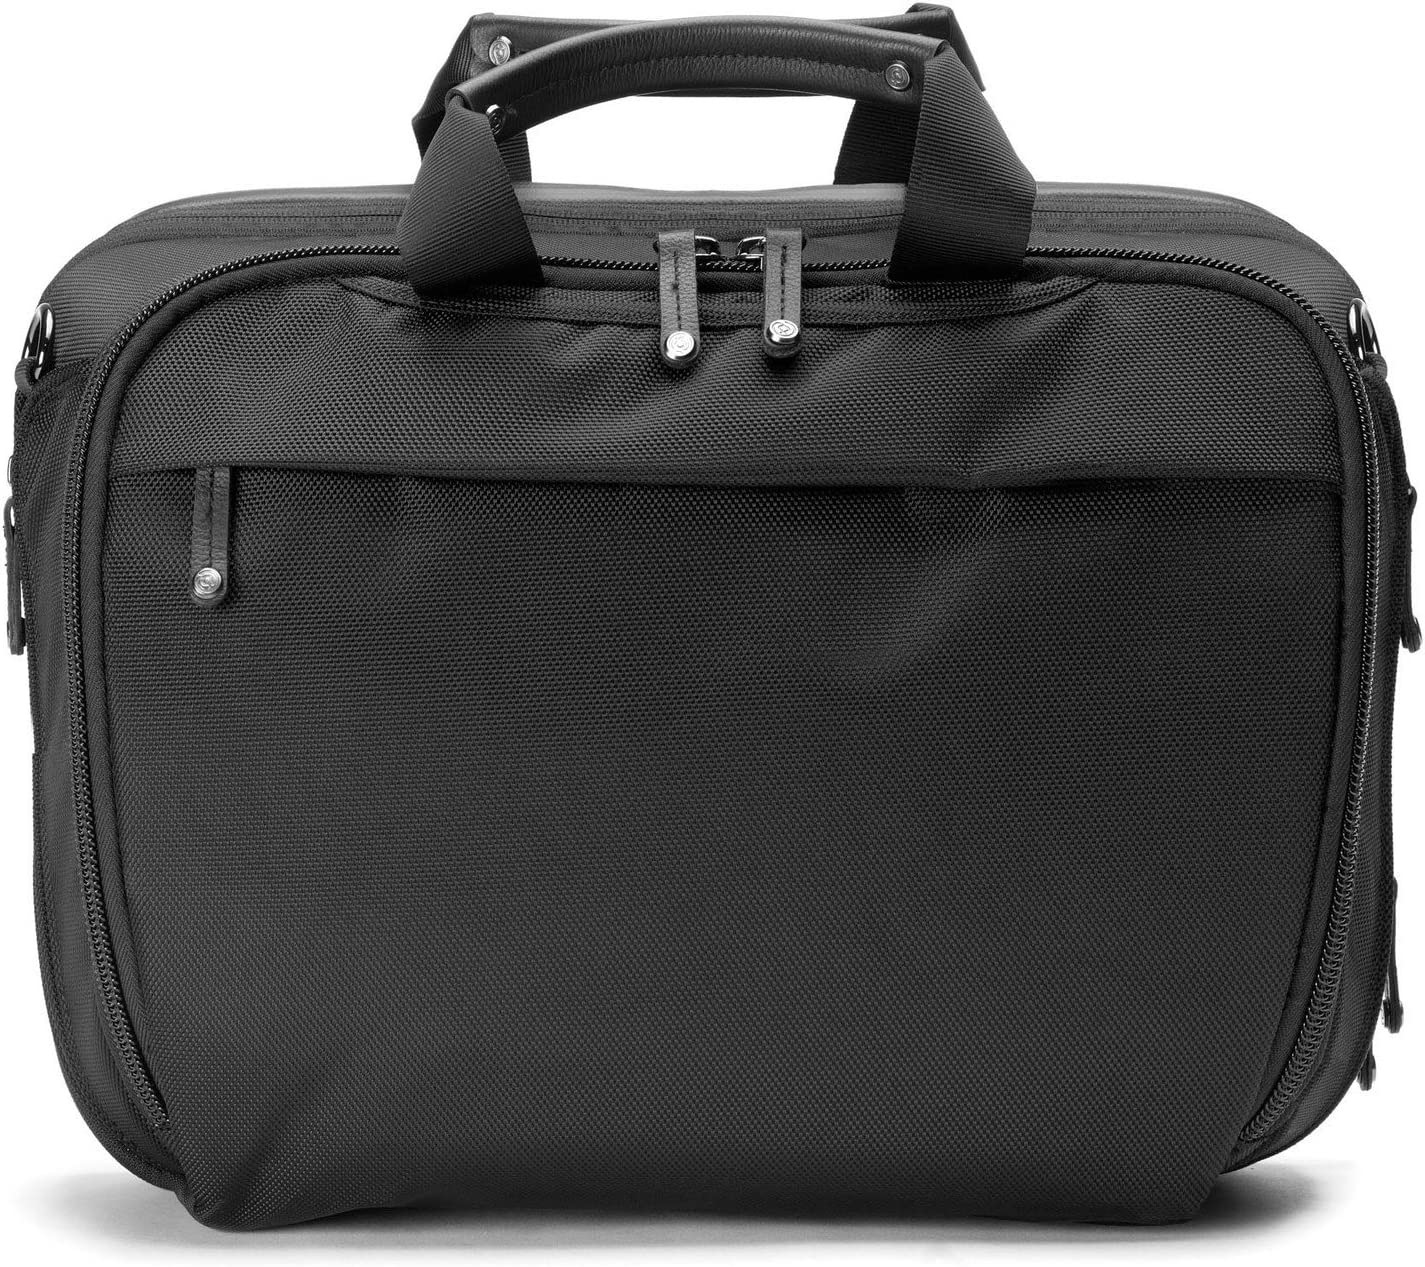 Booq SDP-BLKN Saddle Pro Briefcase, Black-Nylon